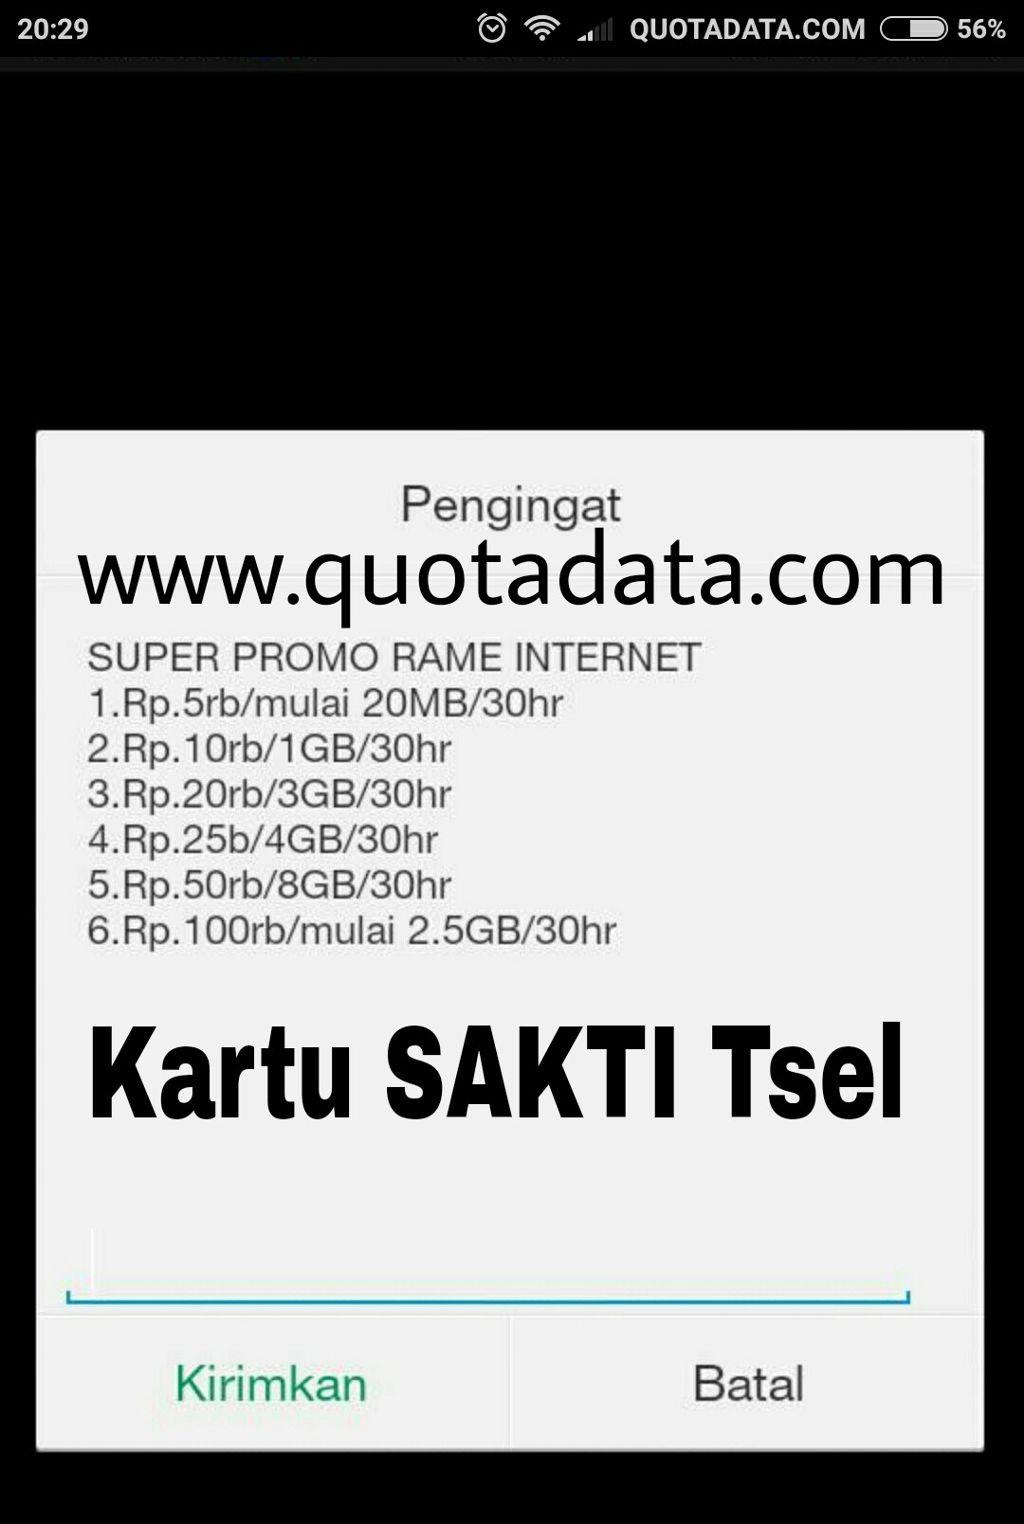 Cara Cek Kartu Sakti Telkomsel 2018 Terbaru Quota Data Perdana Tsel Kuota 9gb Simpati